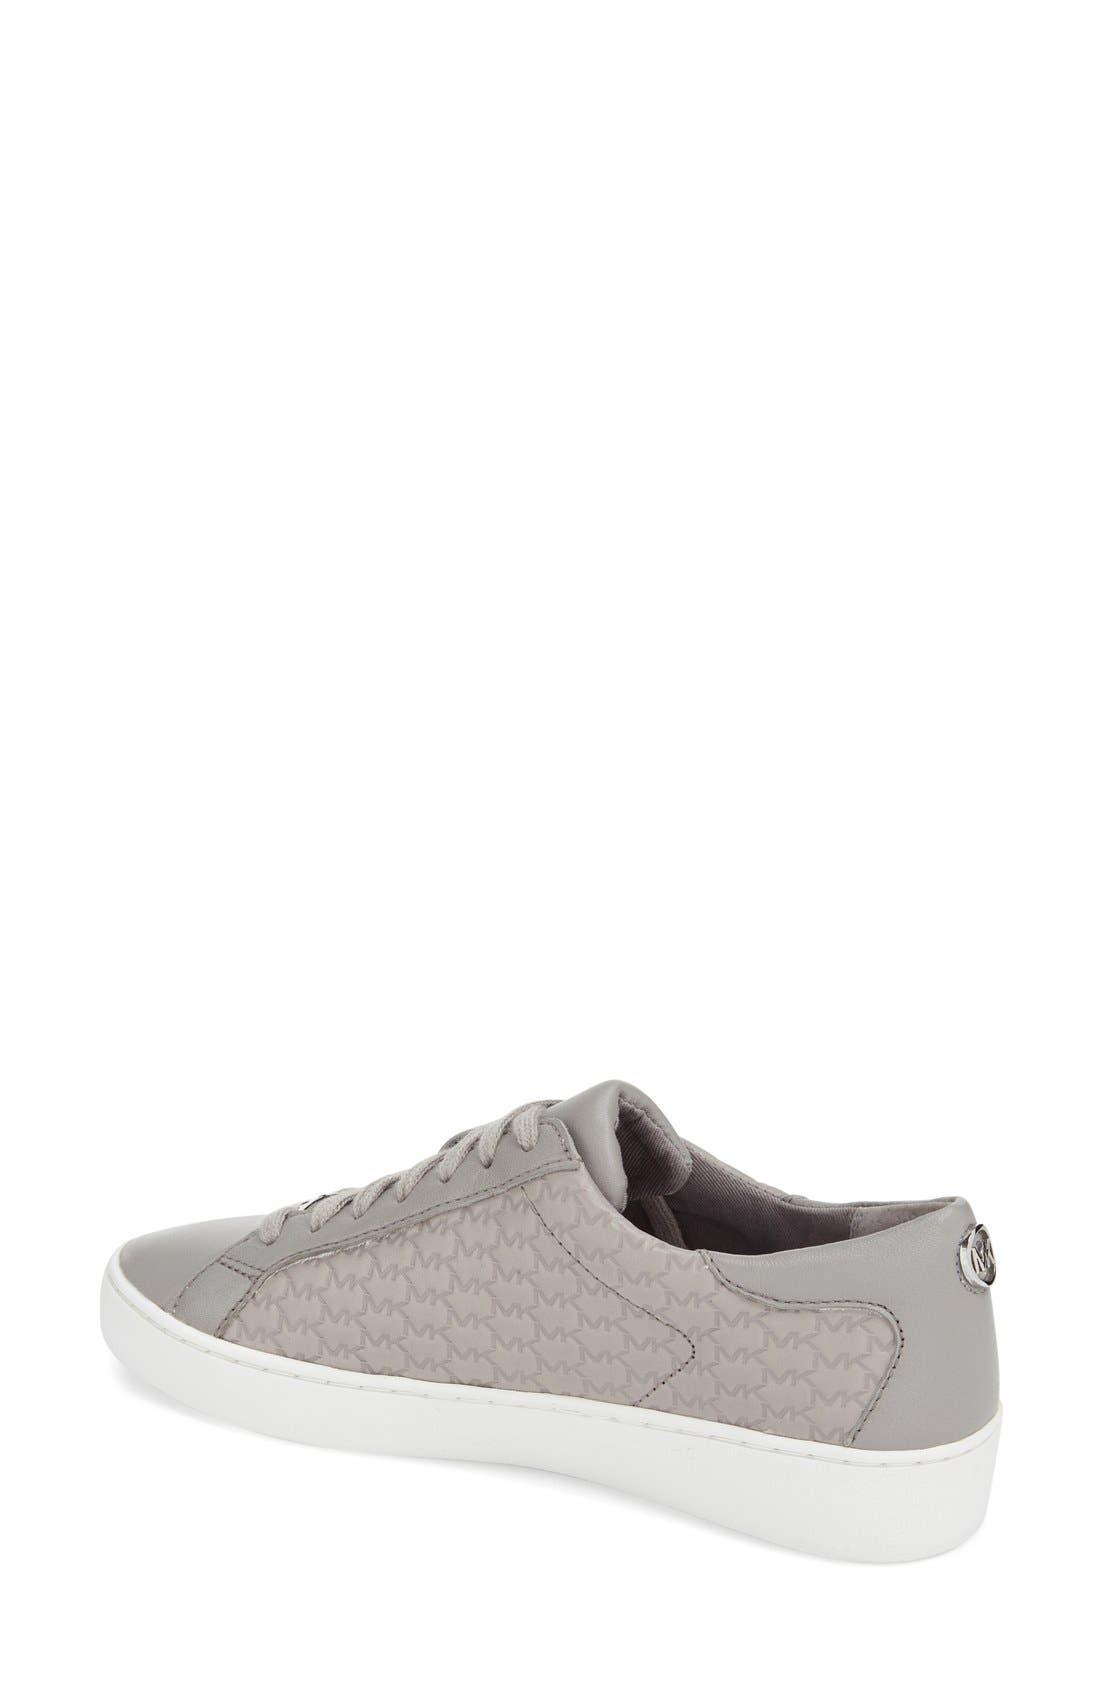 Alternate Image 2  - MICHAEL Michael Kors 'Colby' Textured Sneaker (Women)